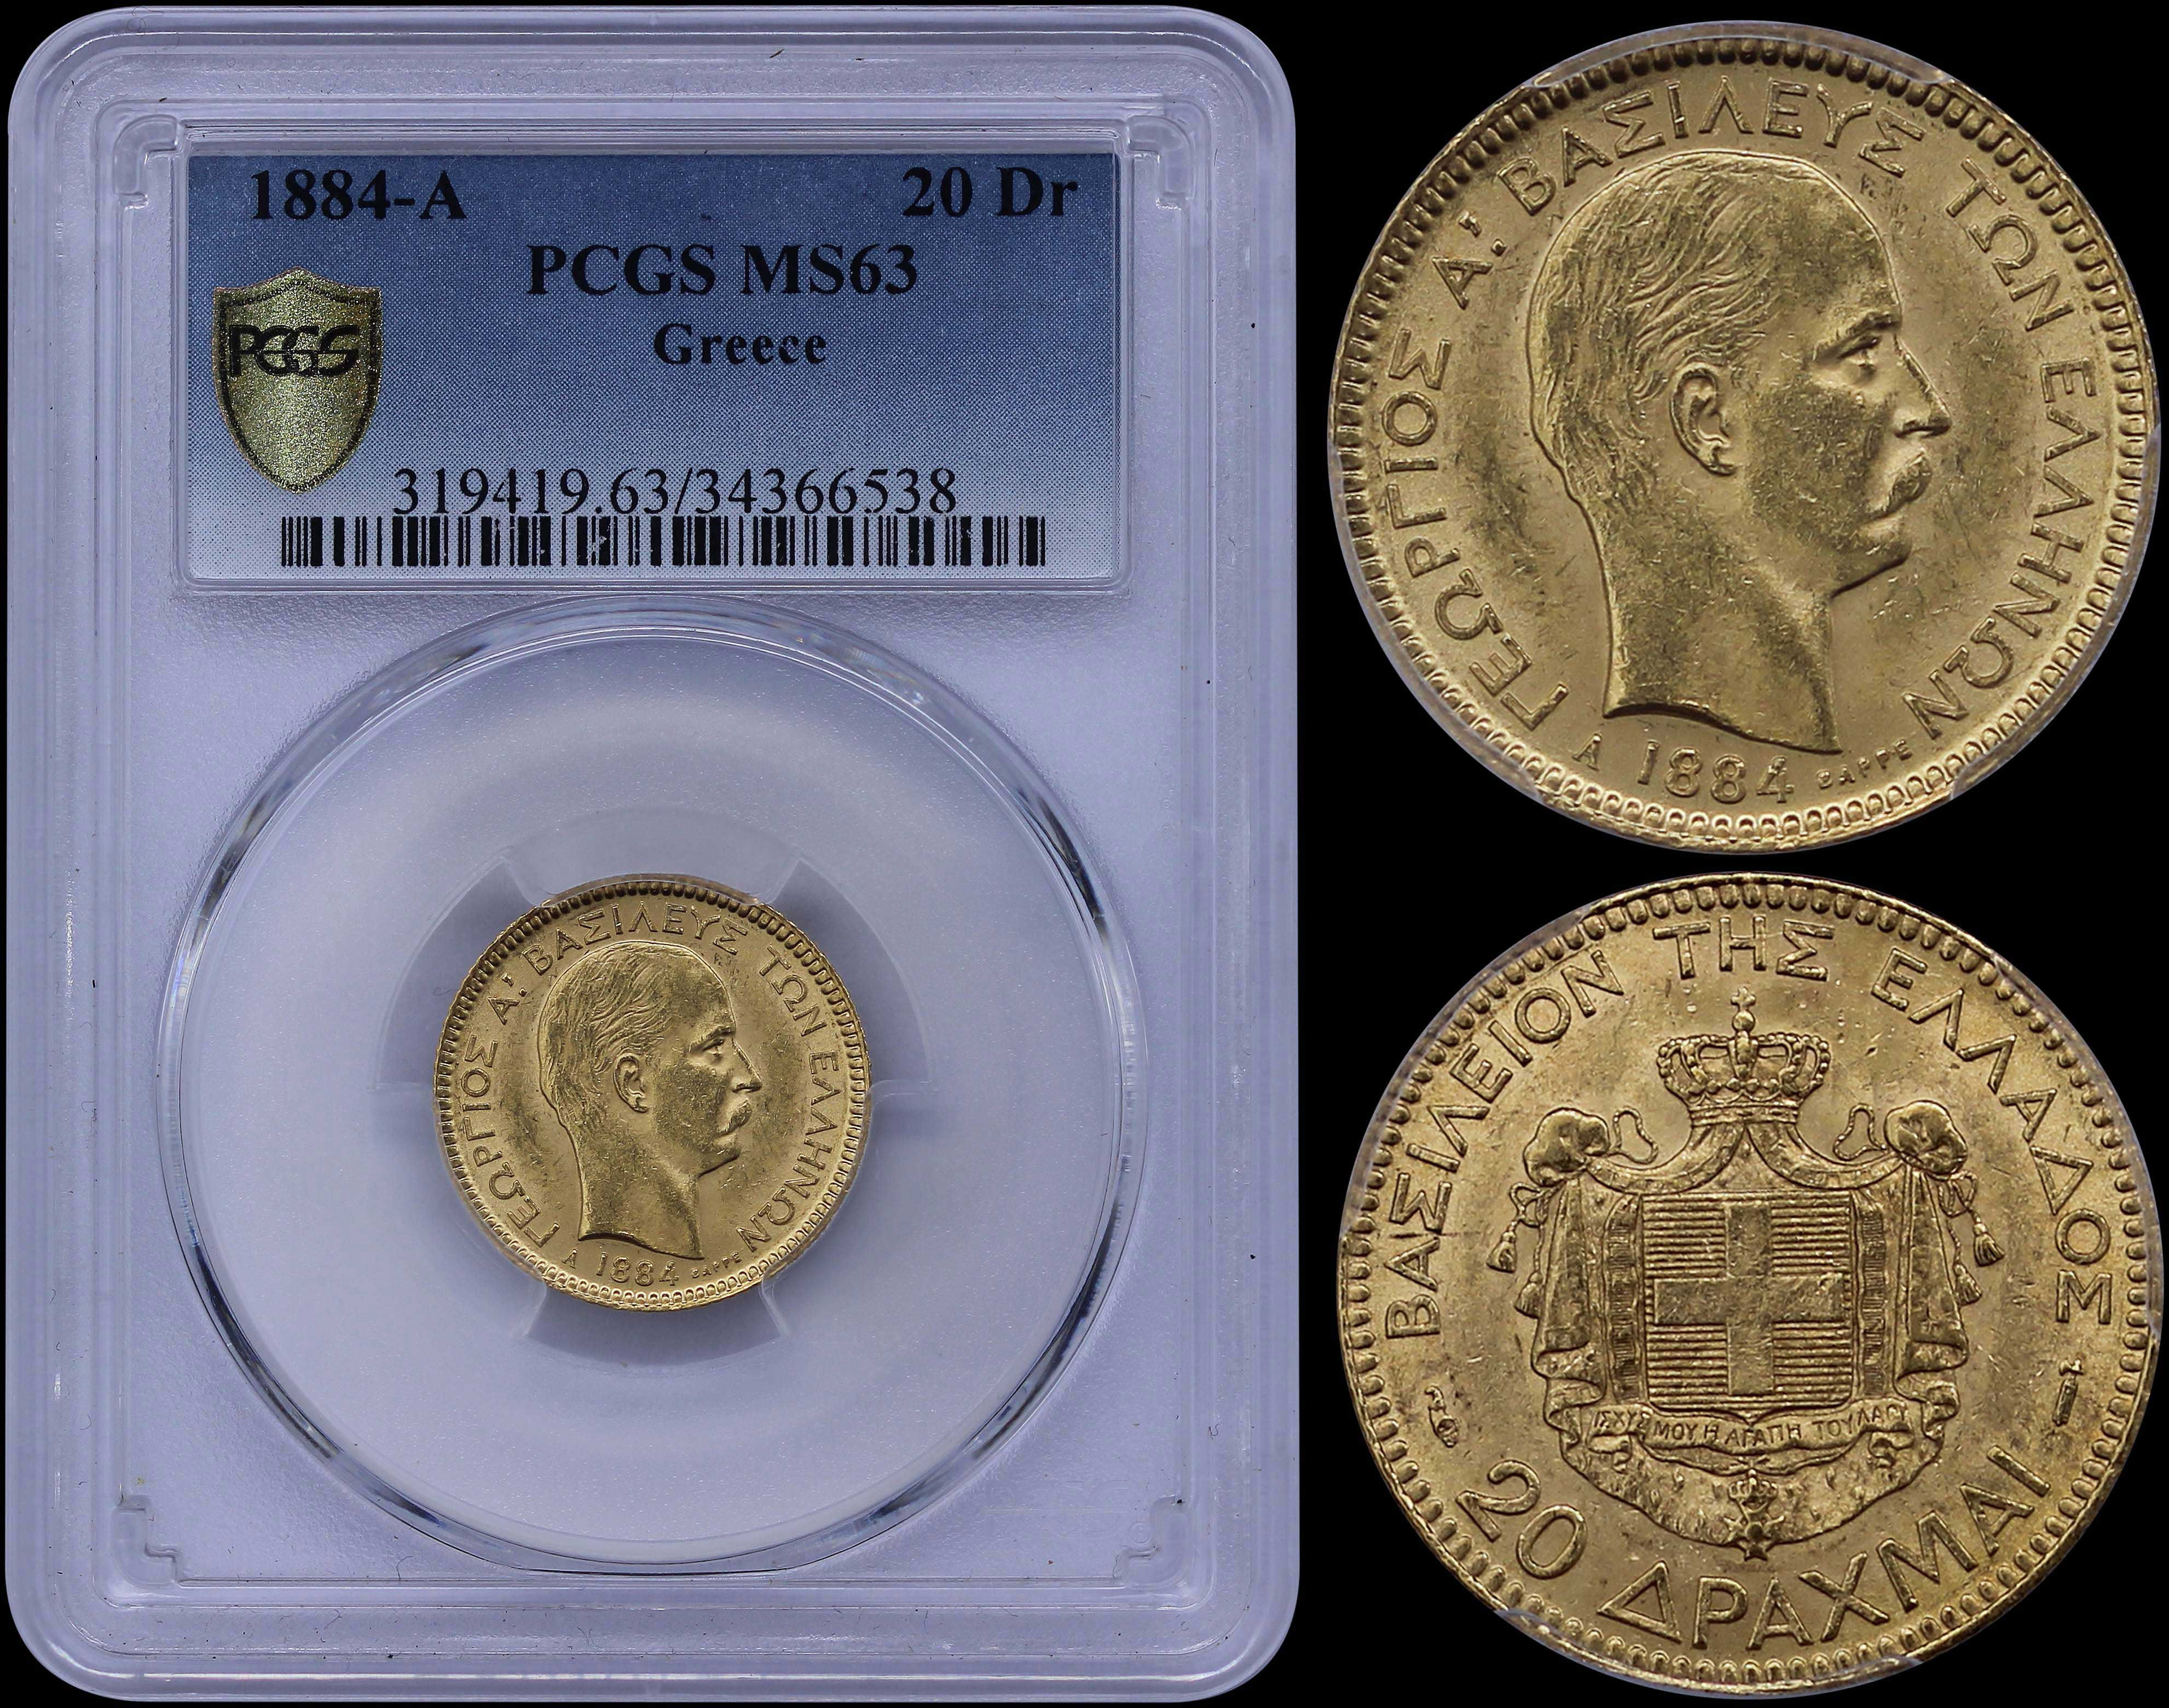 Lot 6104 - -  COINS & TOKENS king george i -  A. Karamitsos Public Auction 655